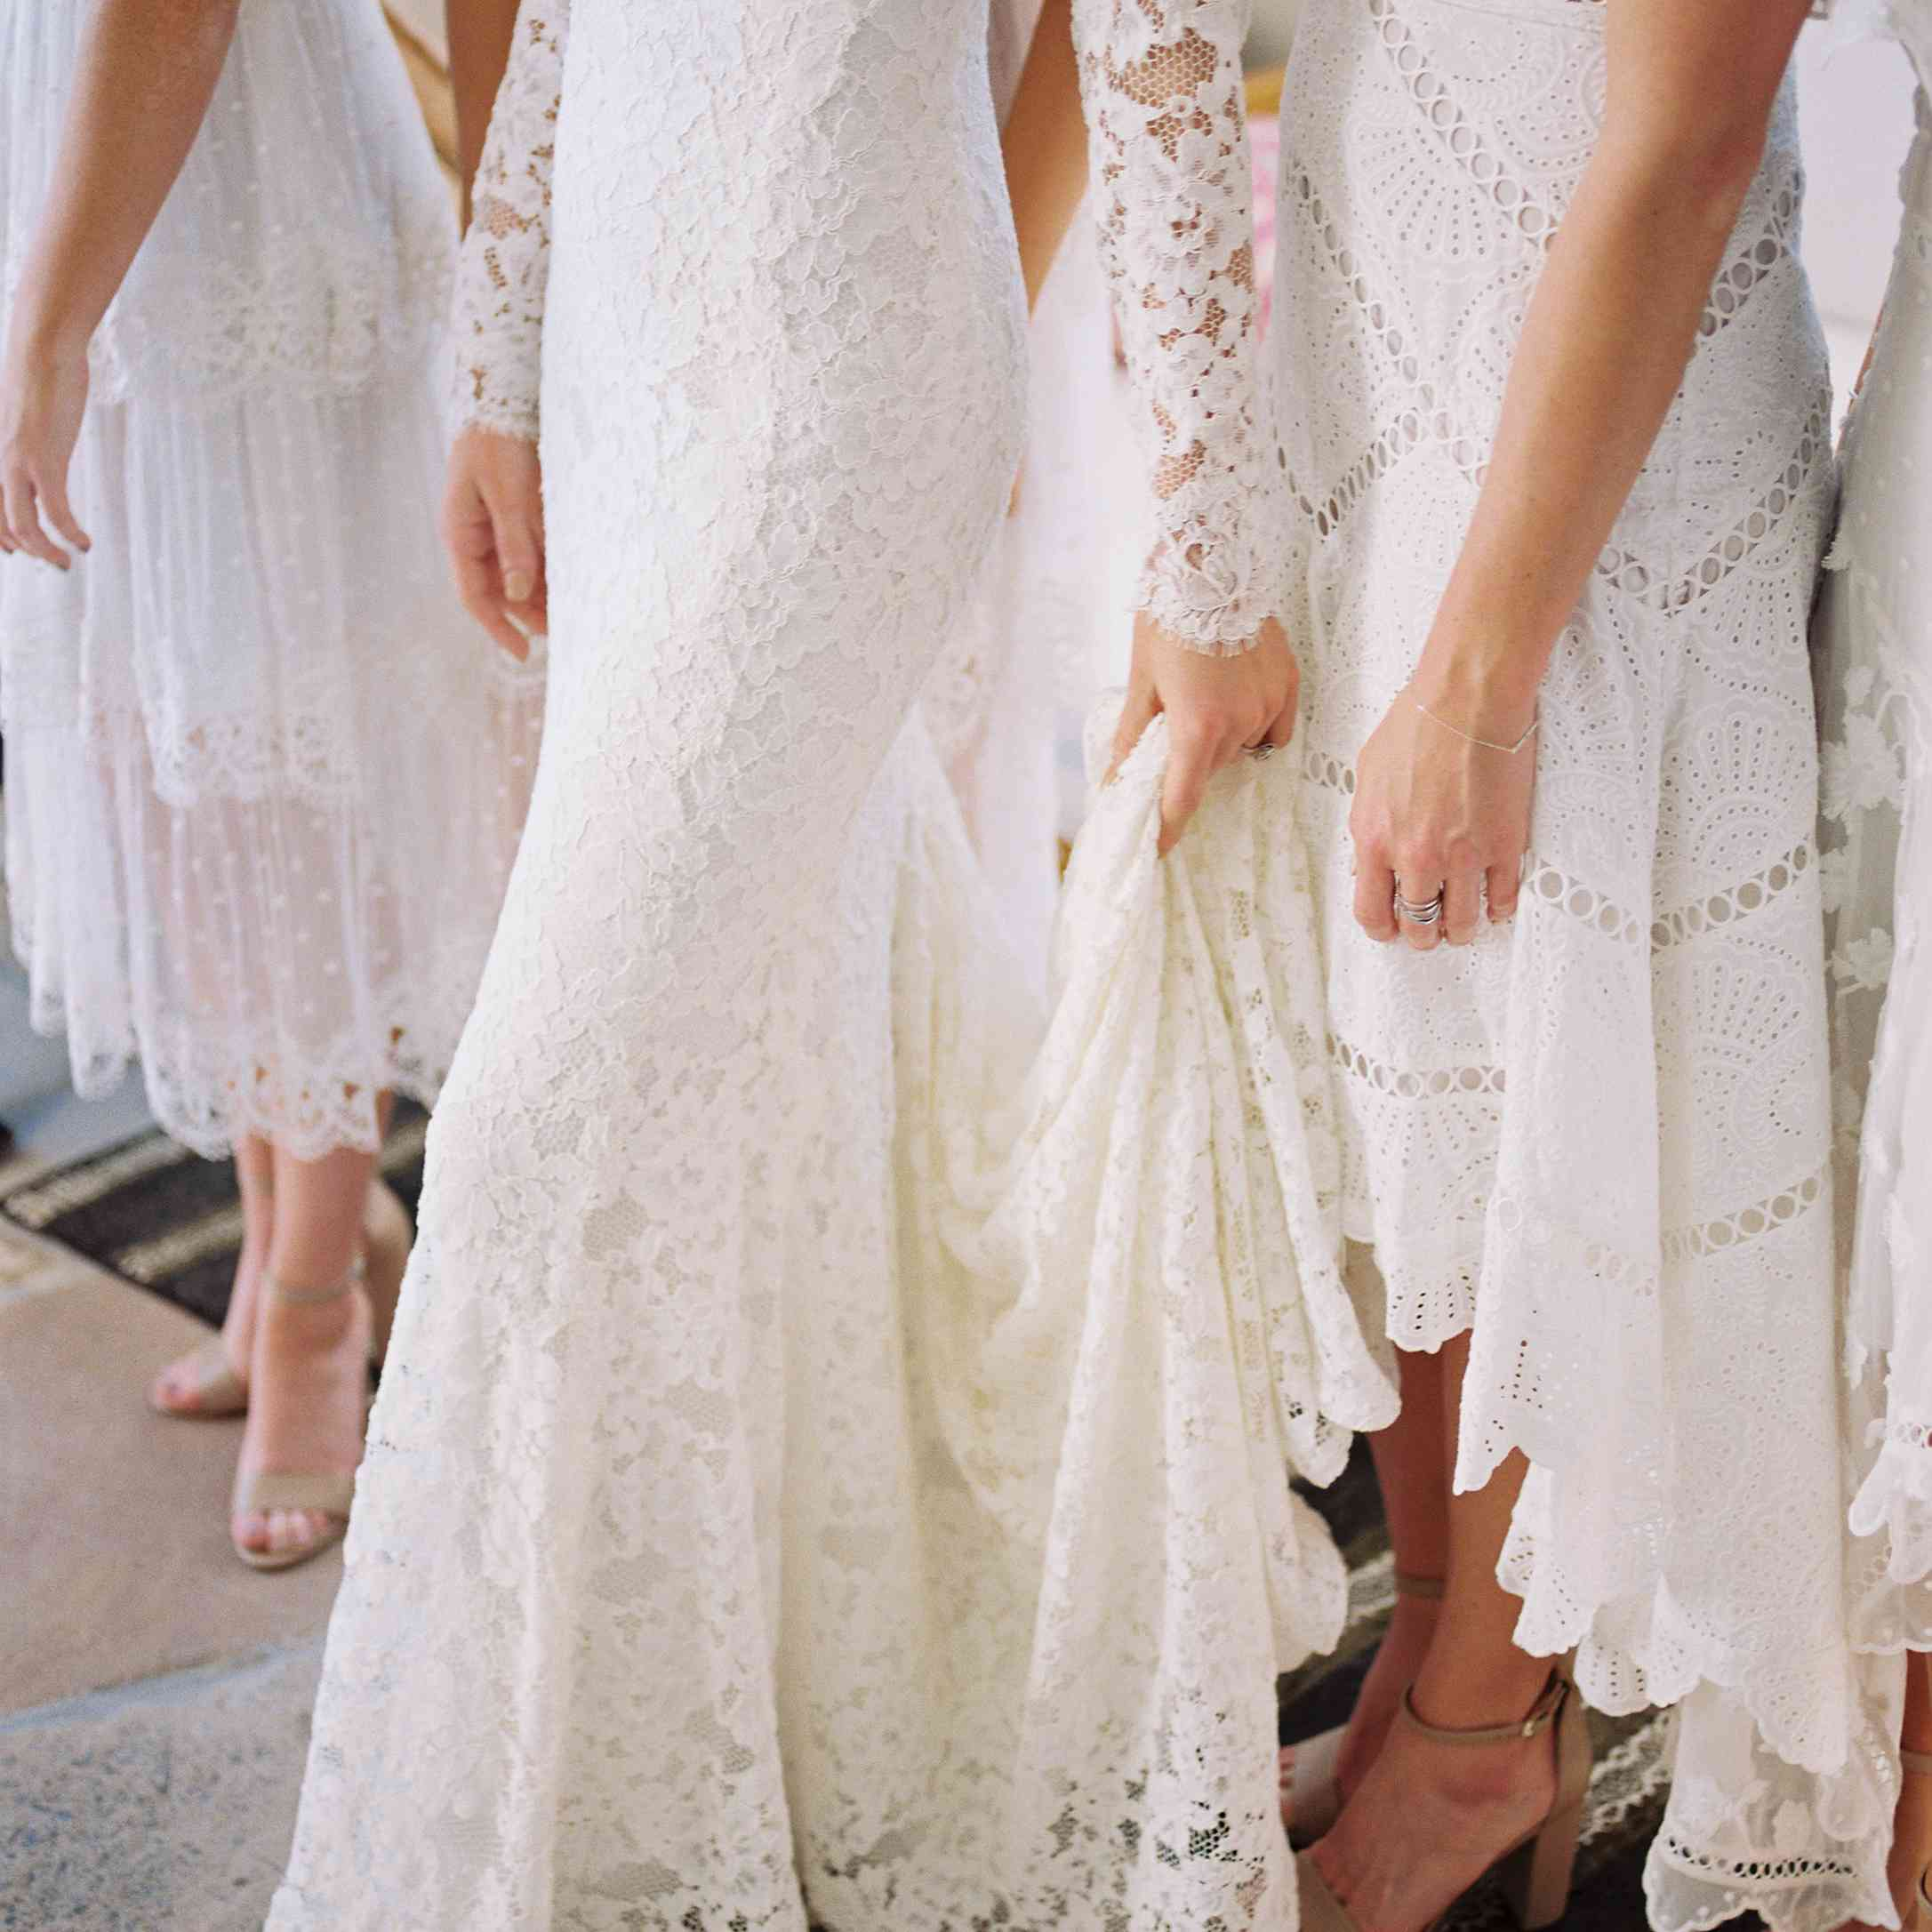 bride's wedding dress with bridesmaids